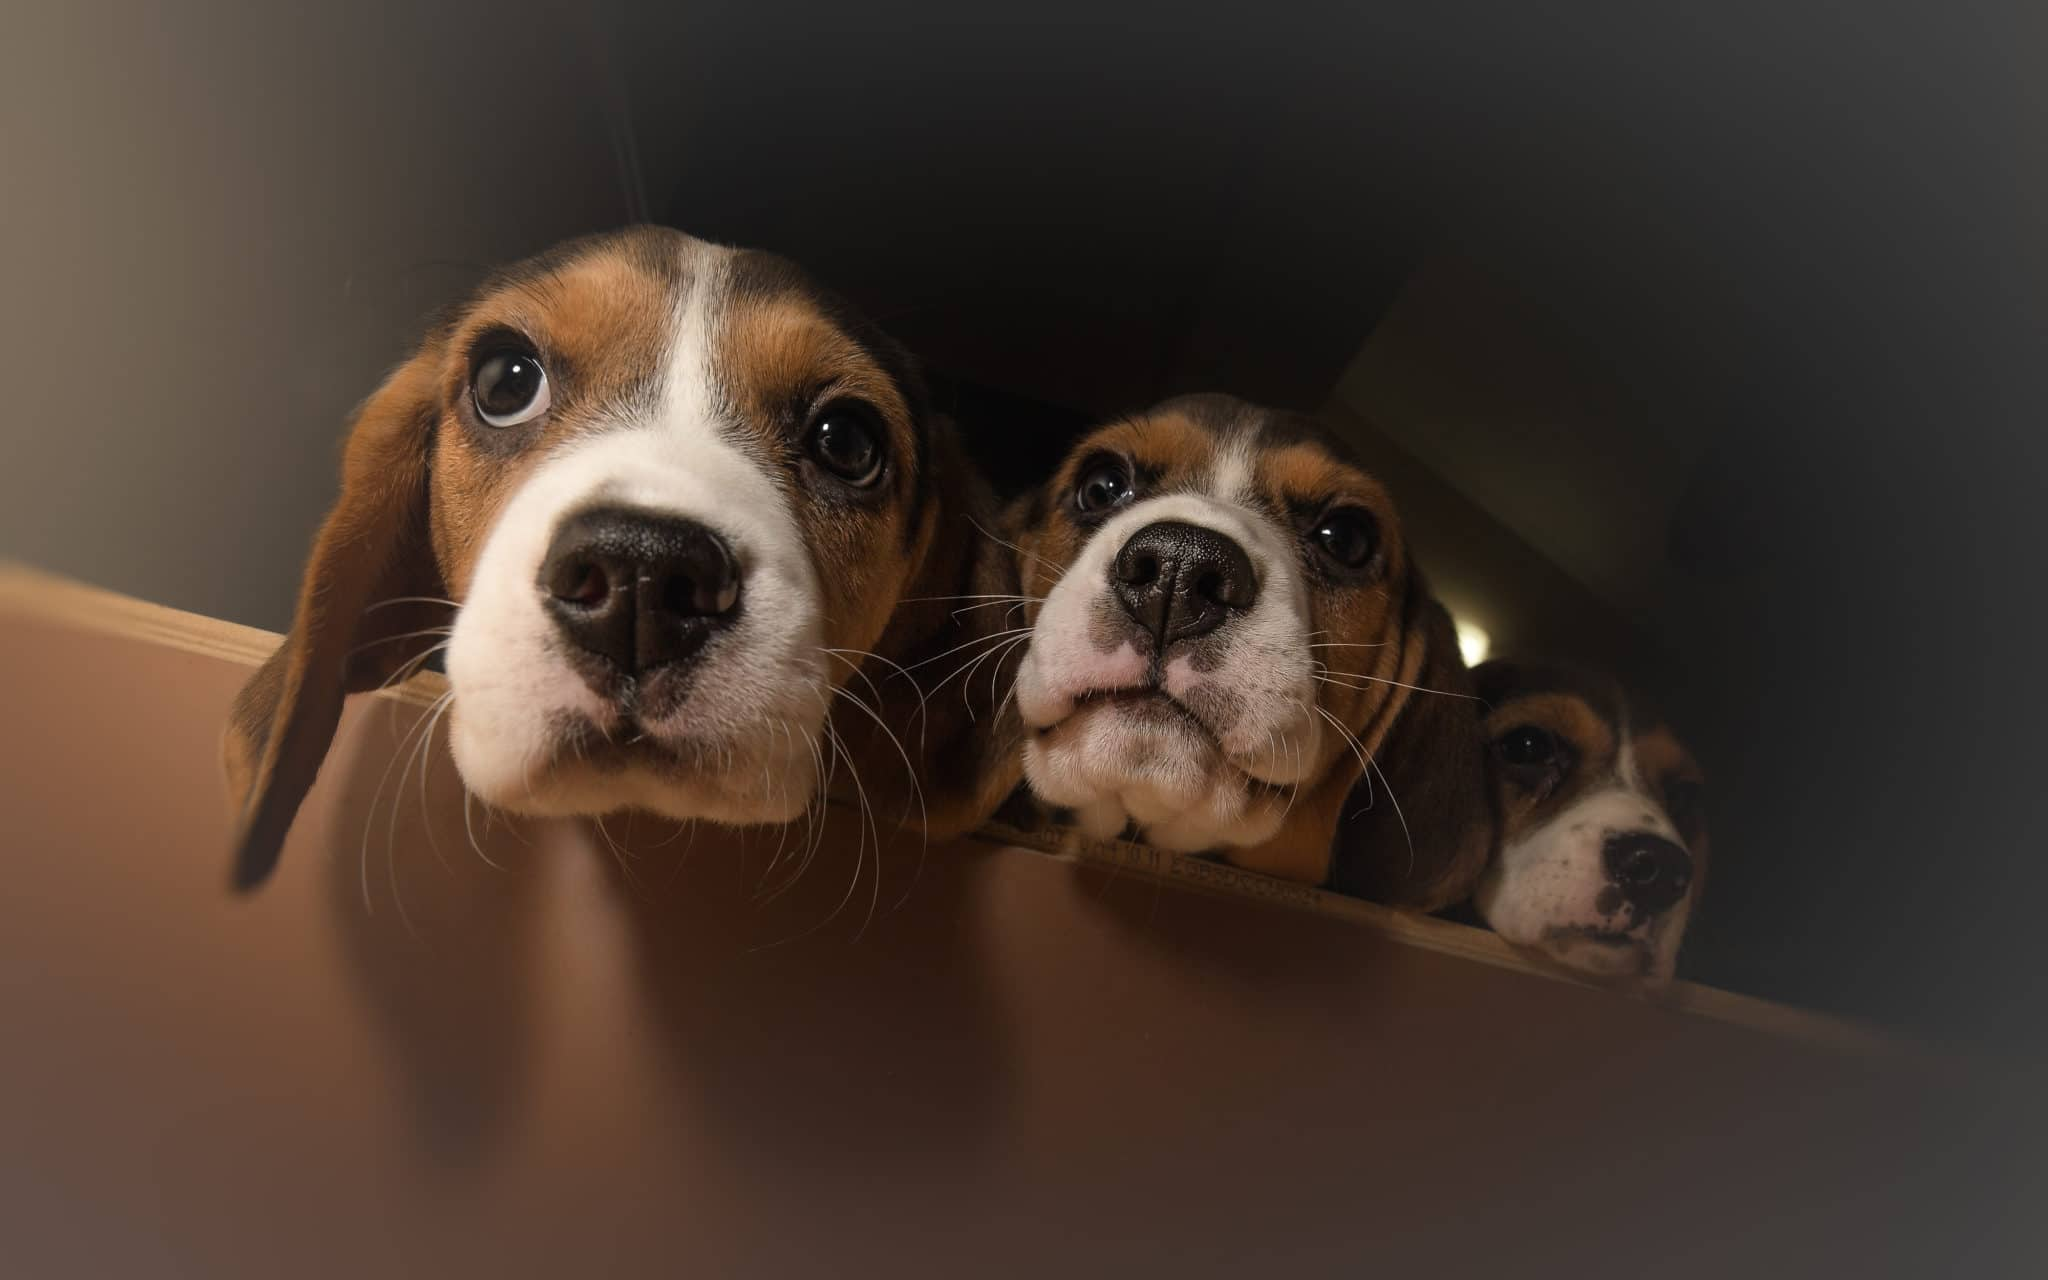 Three Curious Beagle Puppies